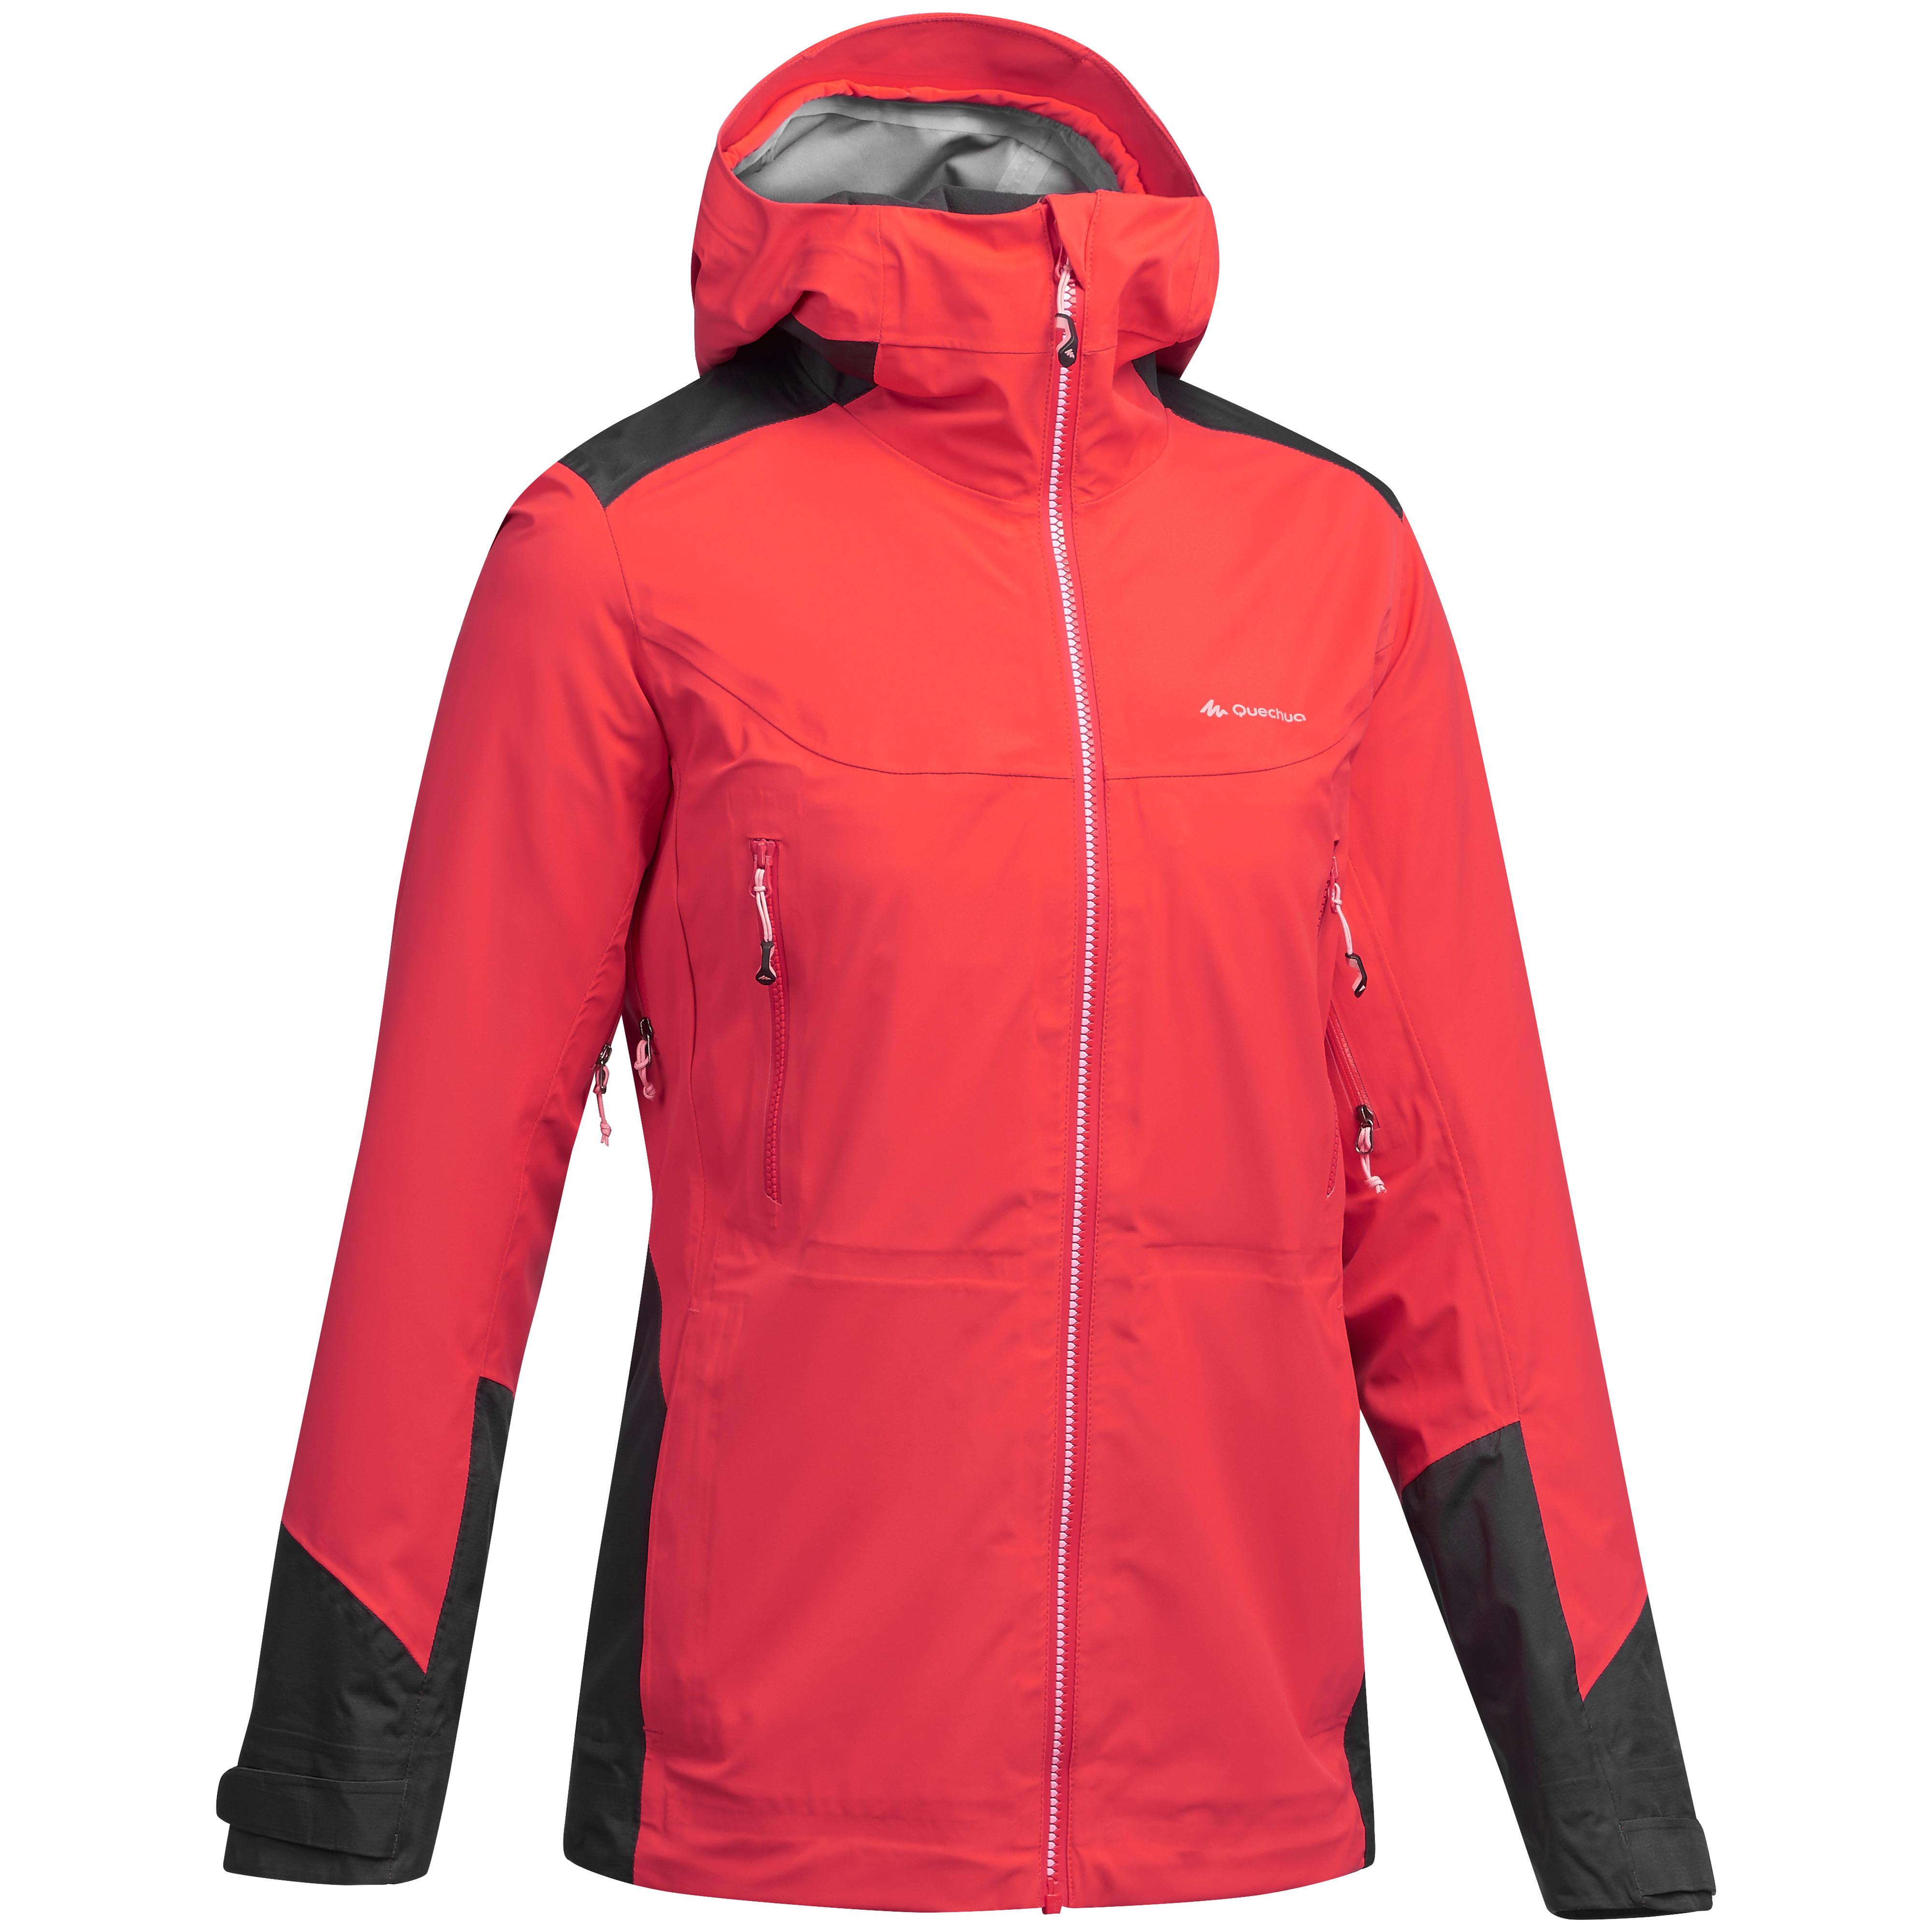 Wanderjacke Bergwandern MH900 wasserdicht Damen orange   Sportbekleidung > Sportjacken > Outdoorjacken   Rot   Quechua